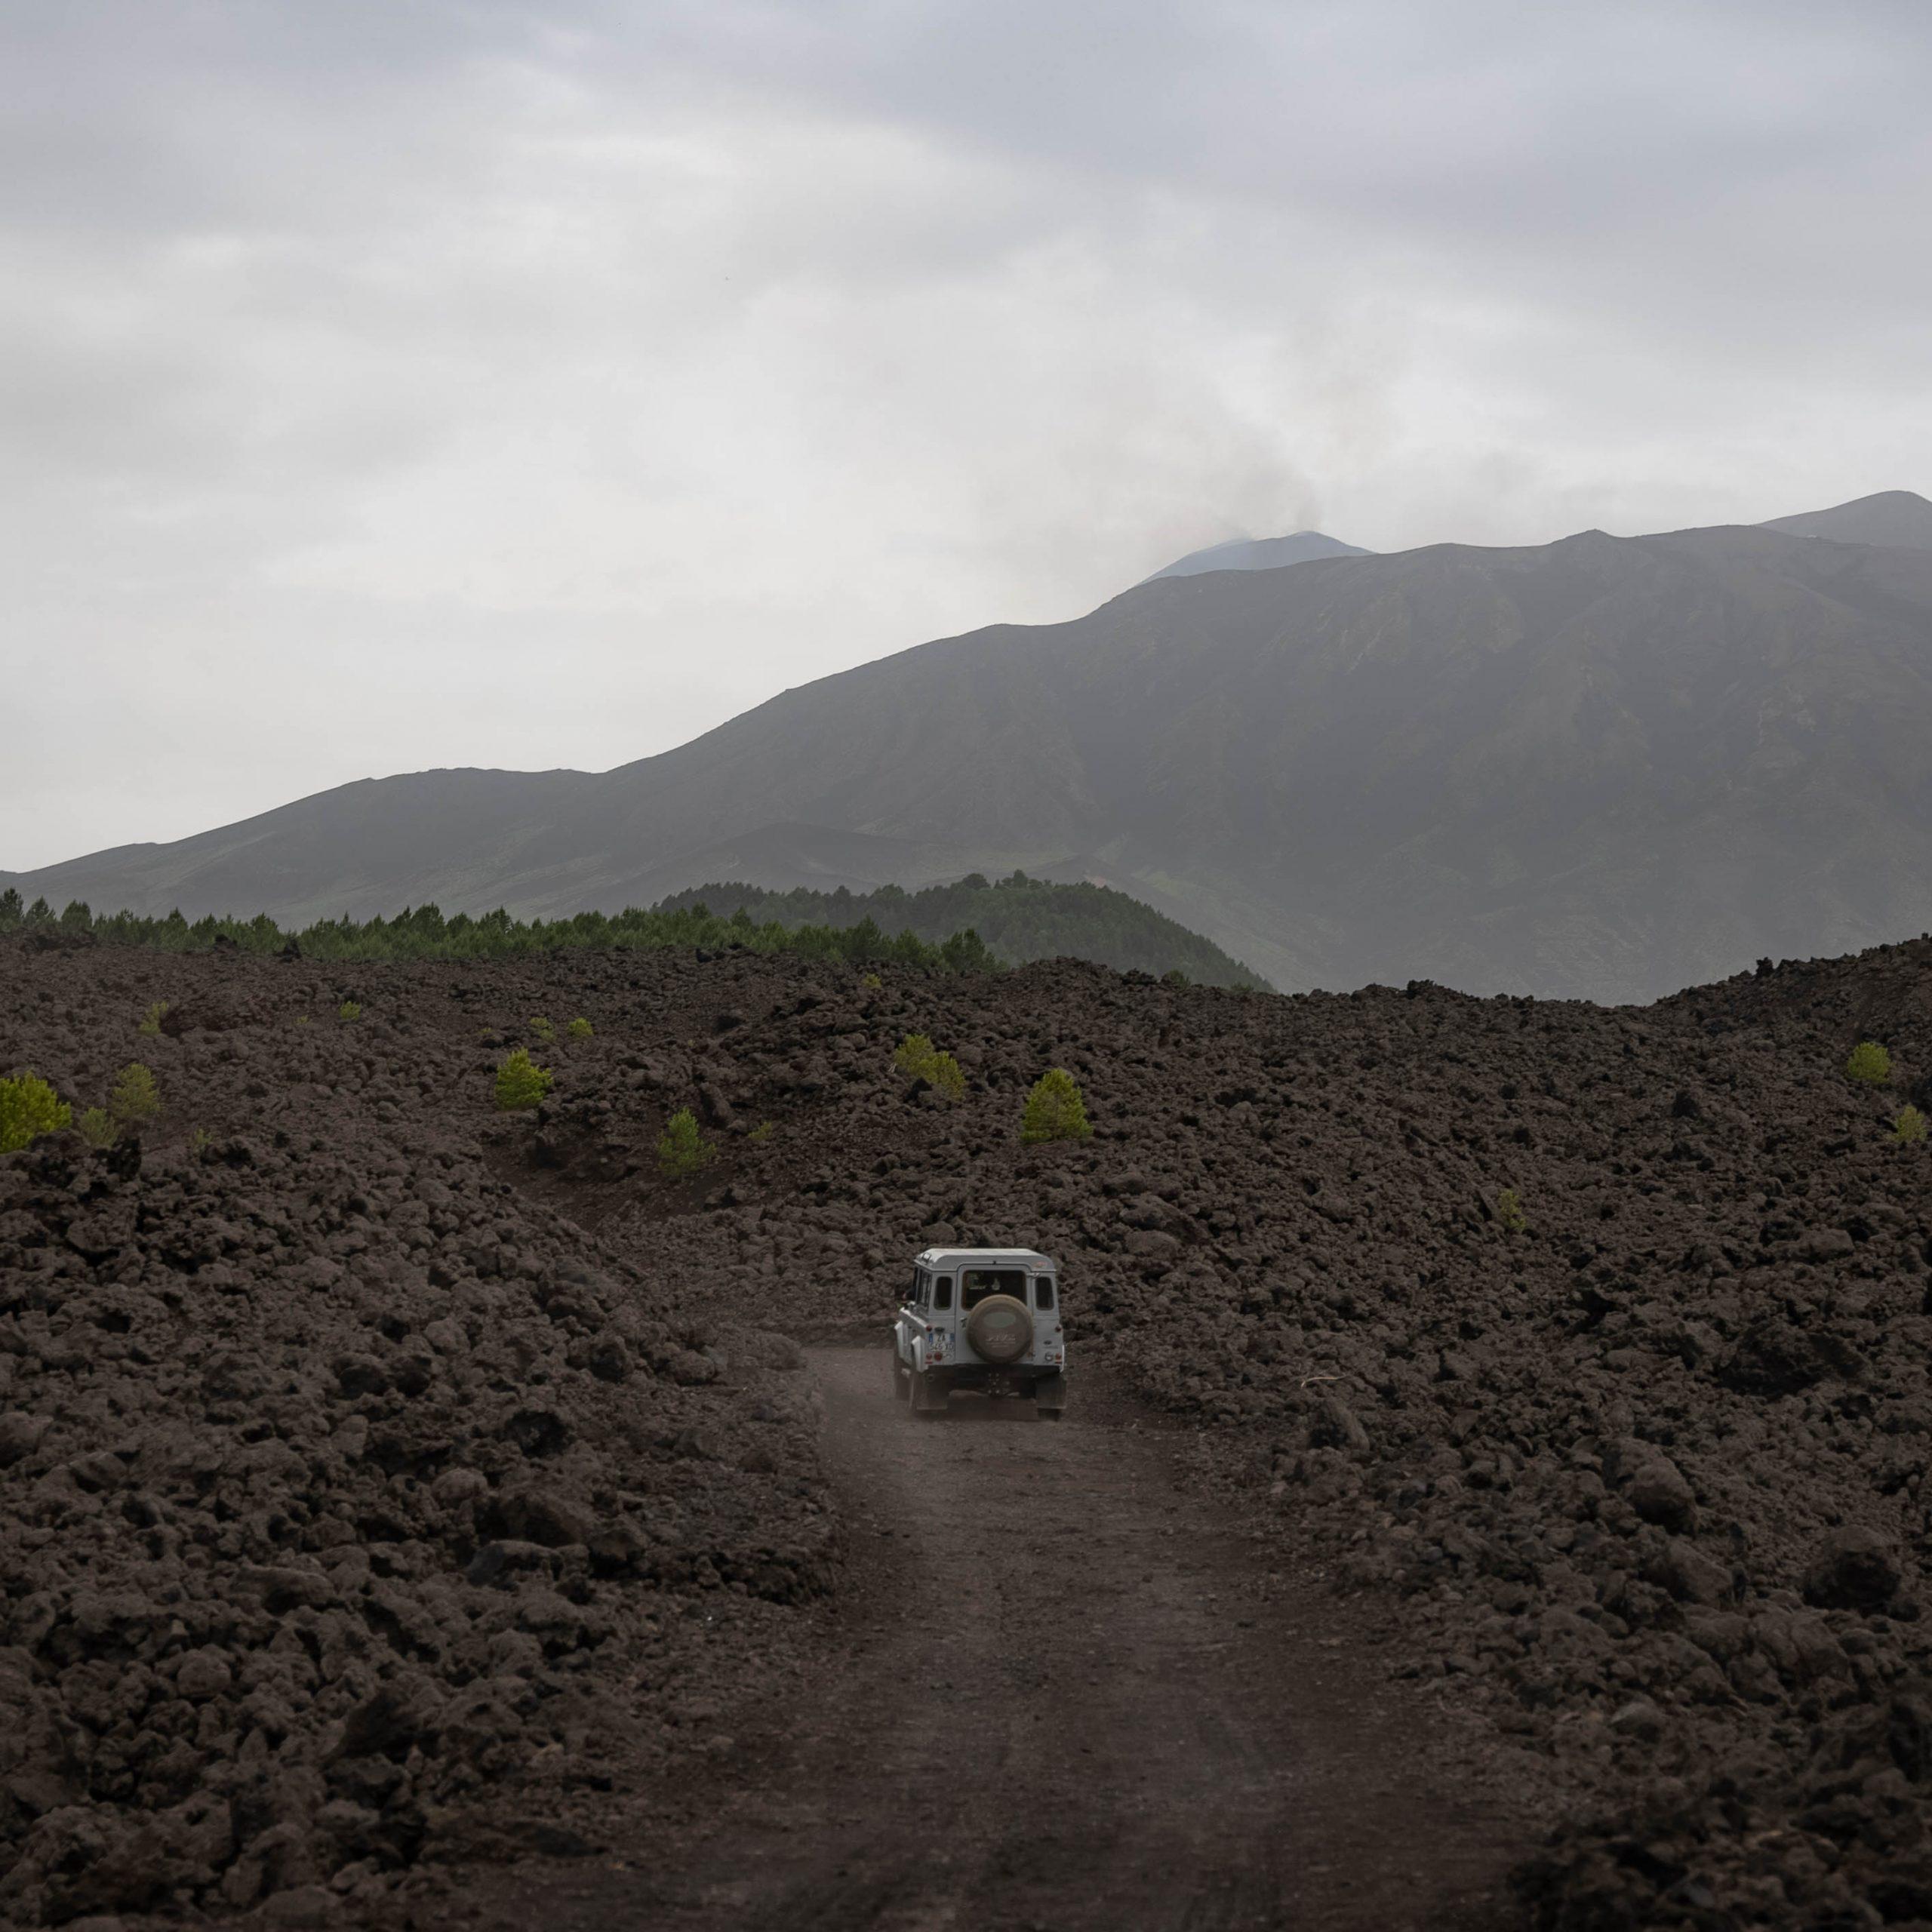 Land_Rover_Tour_Sicilia_2021_Land_Rover_Experience_Italia_-110